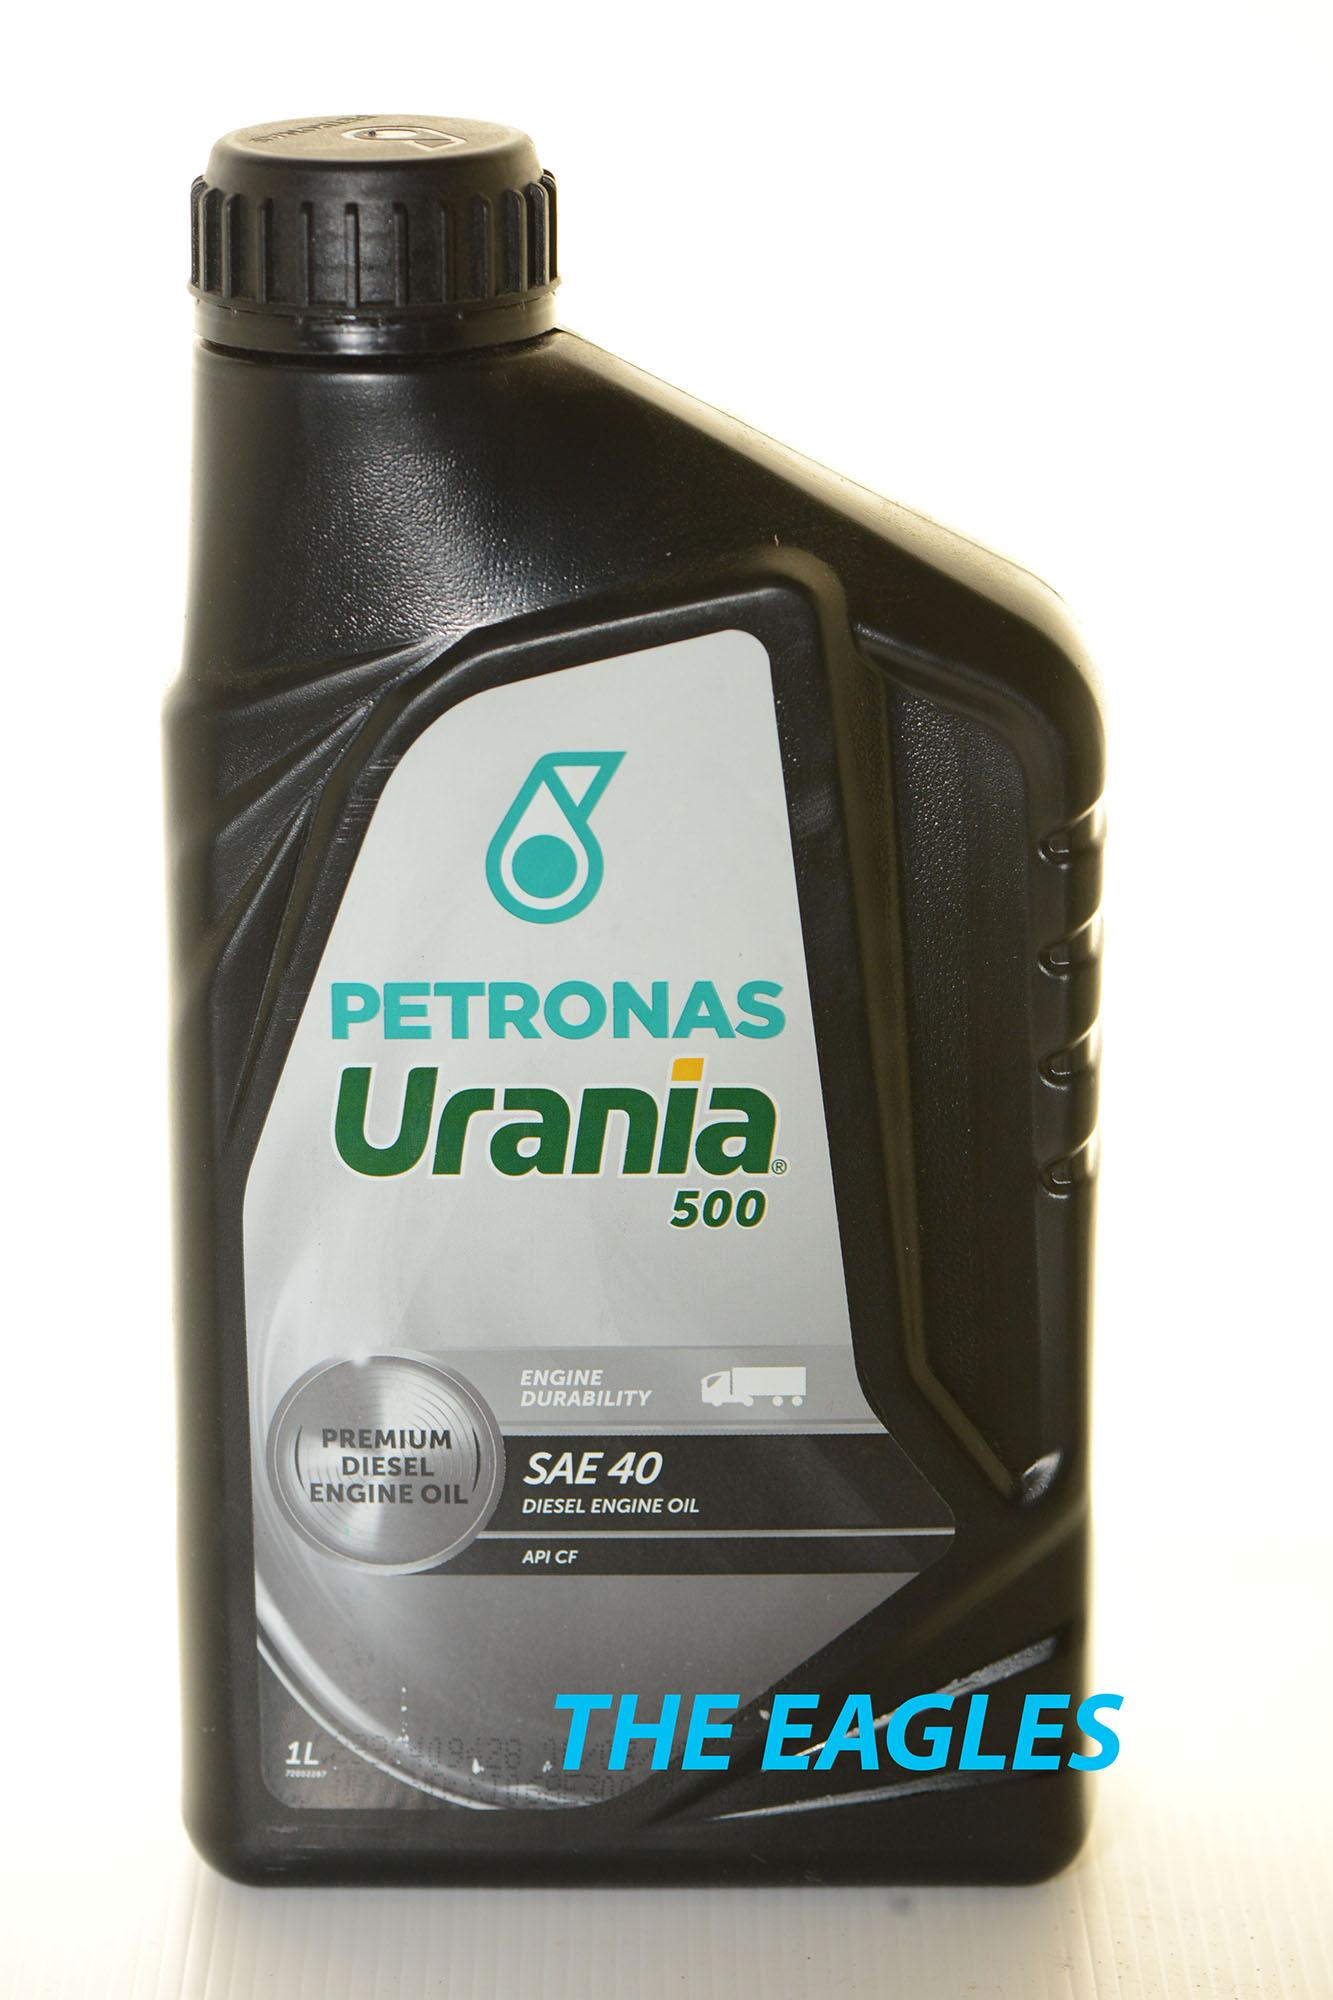 Oli Oil Petronas Urania 500 SAE 40 Mesin Diesel API CF Minyak Lubrikasi Lubricant Mobil Solar